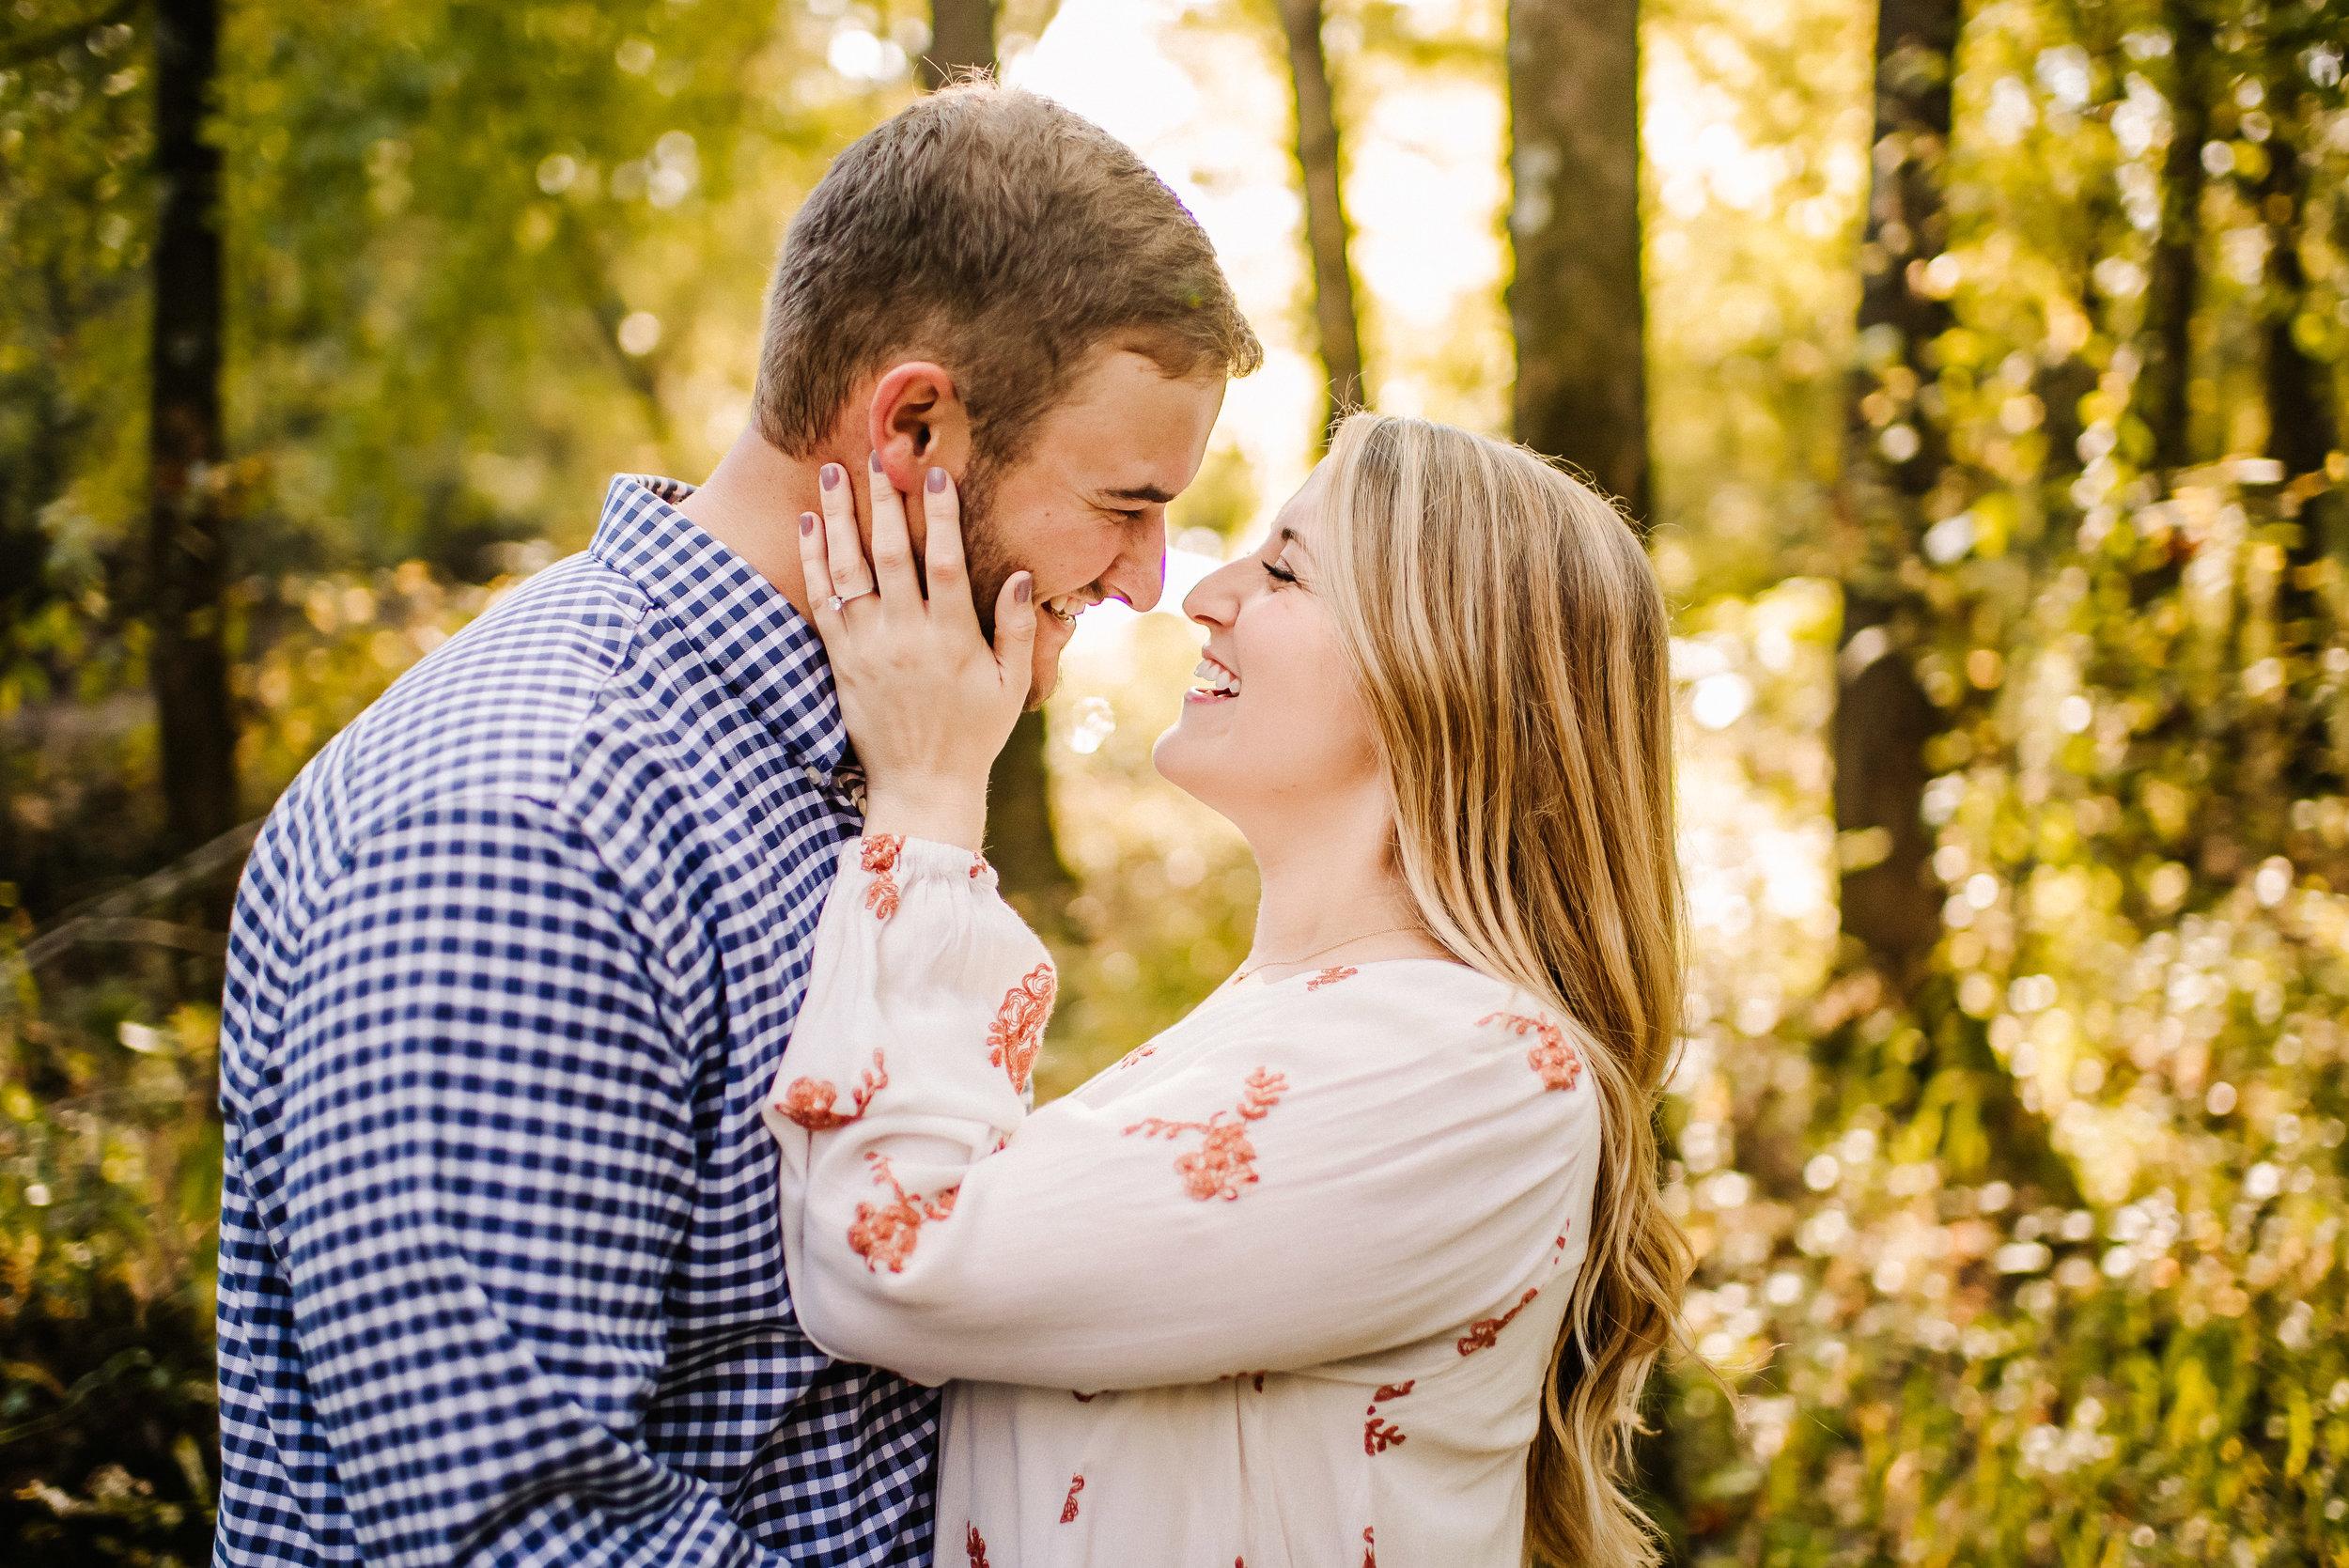 Romantic Fall Engagement Photography_Alexis & Jacob_Ashley Benham Photography-78.jpg